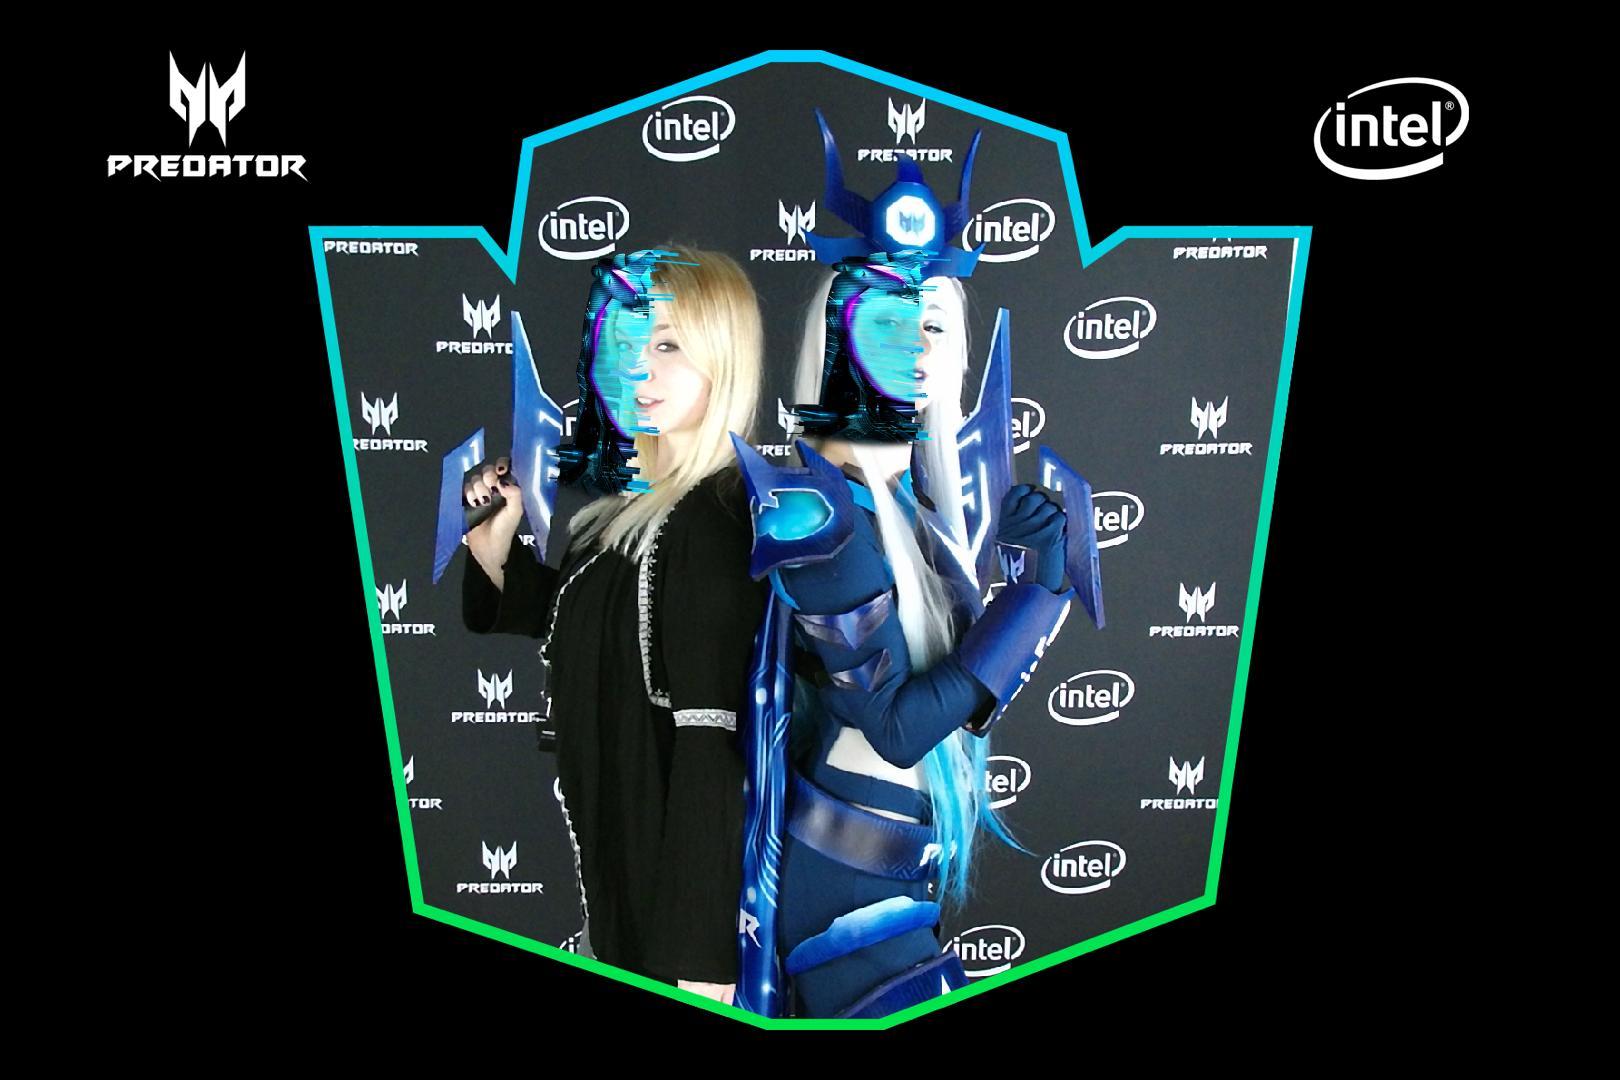 IMANOX_Fotobox_Augmented Reality_Acer.jpg